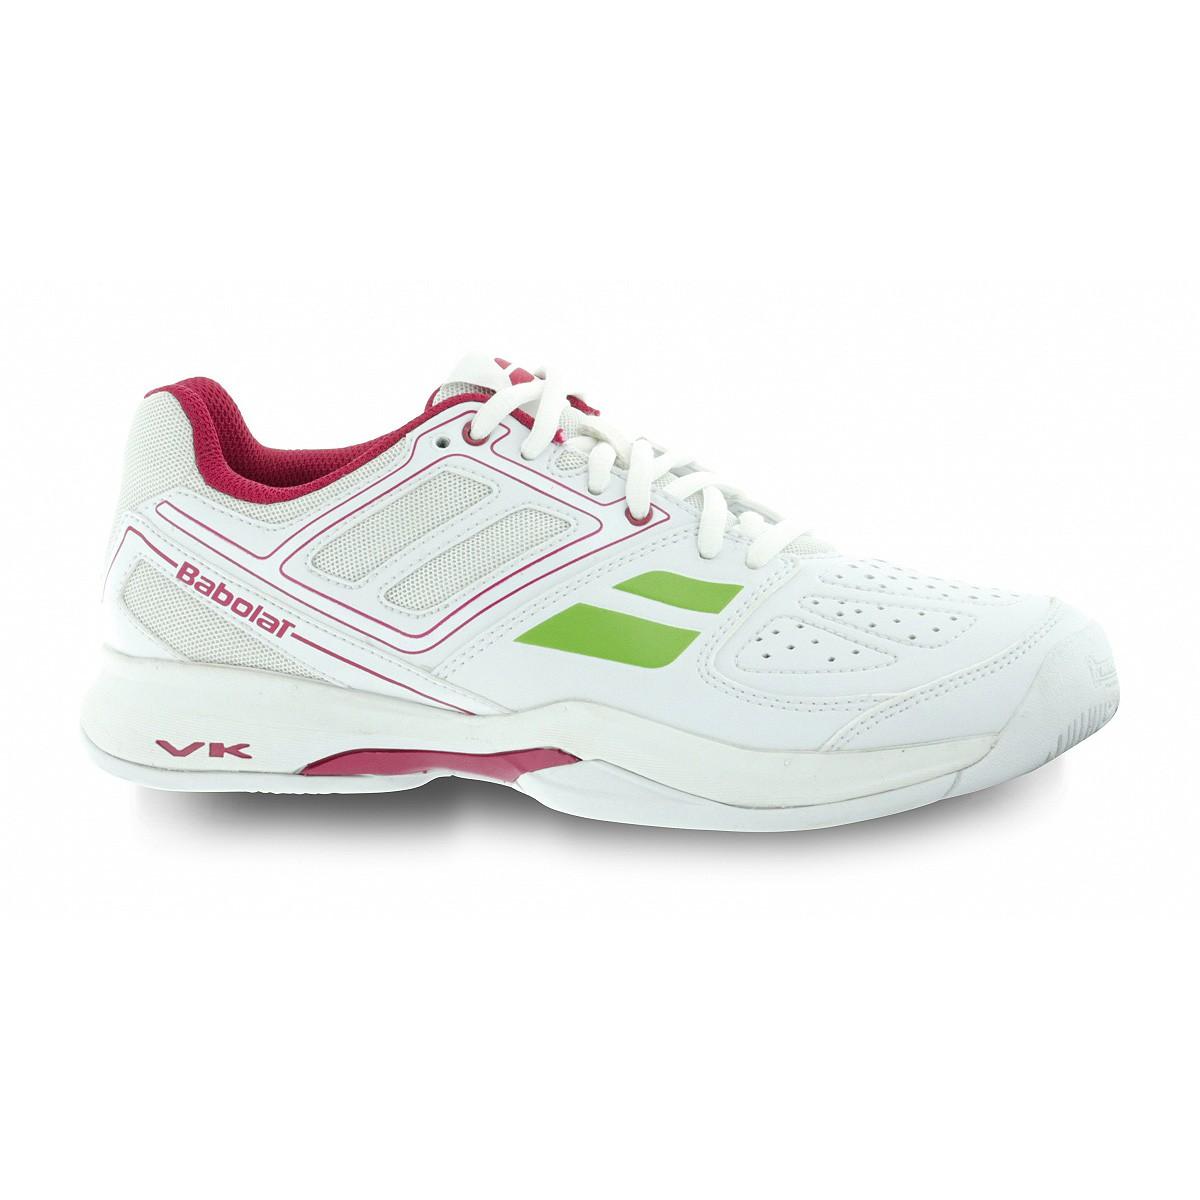 Buty tenisowe damskie Babolat Pulsion BPM